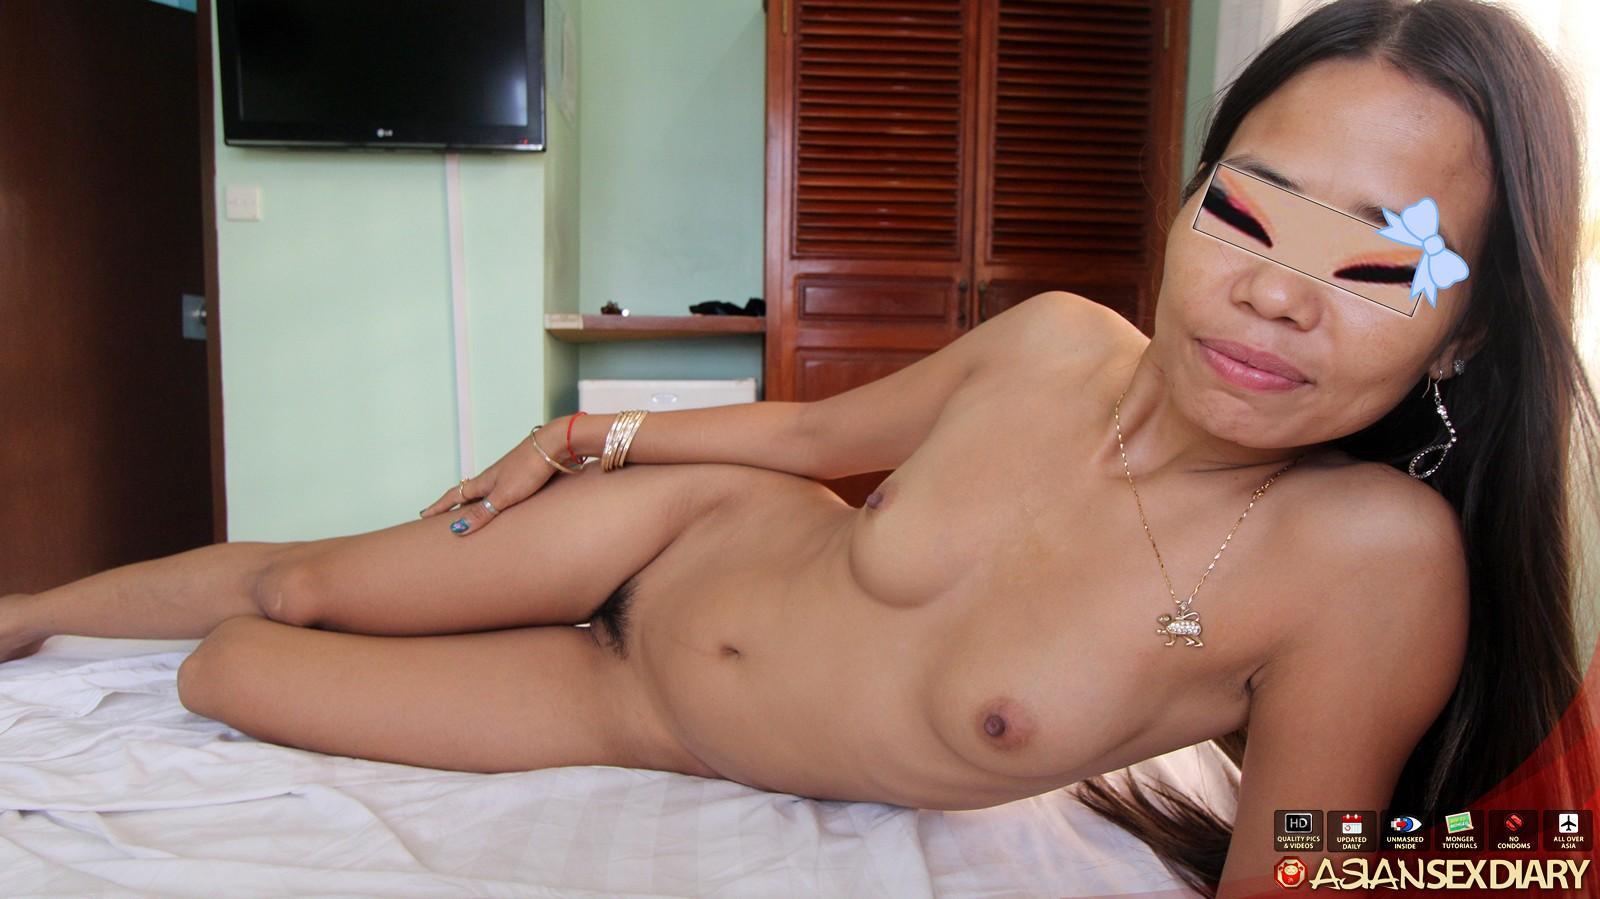 diary Asian sex